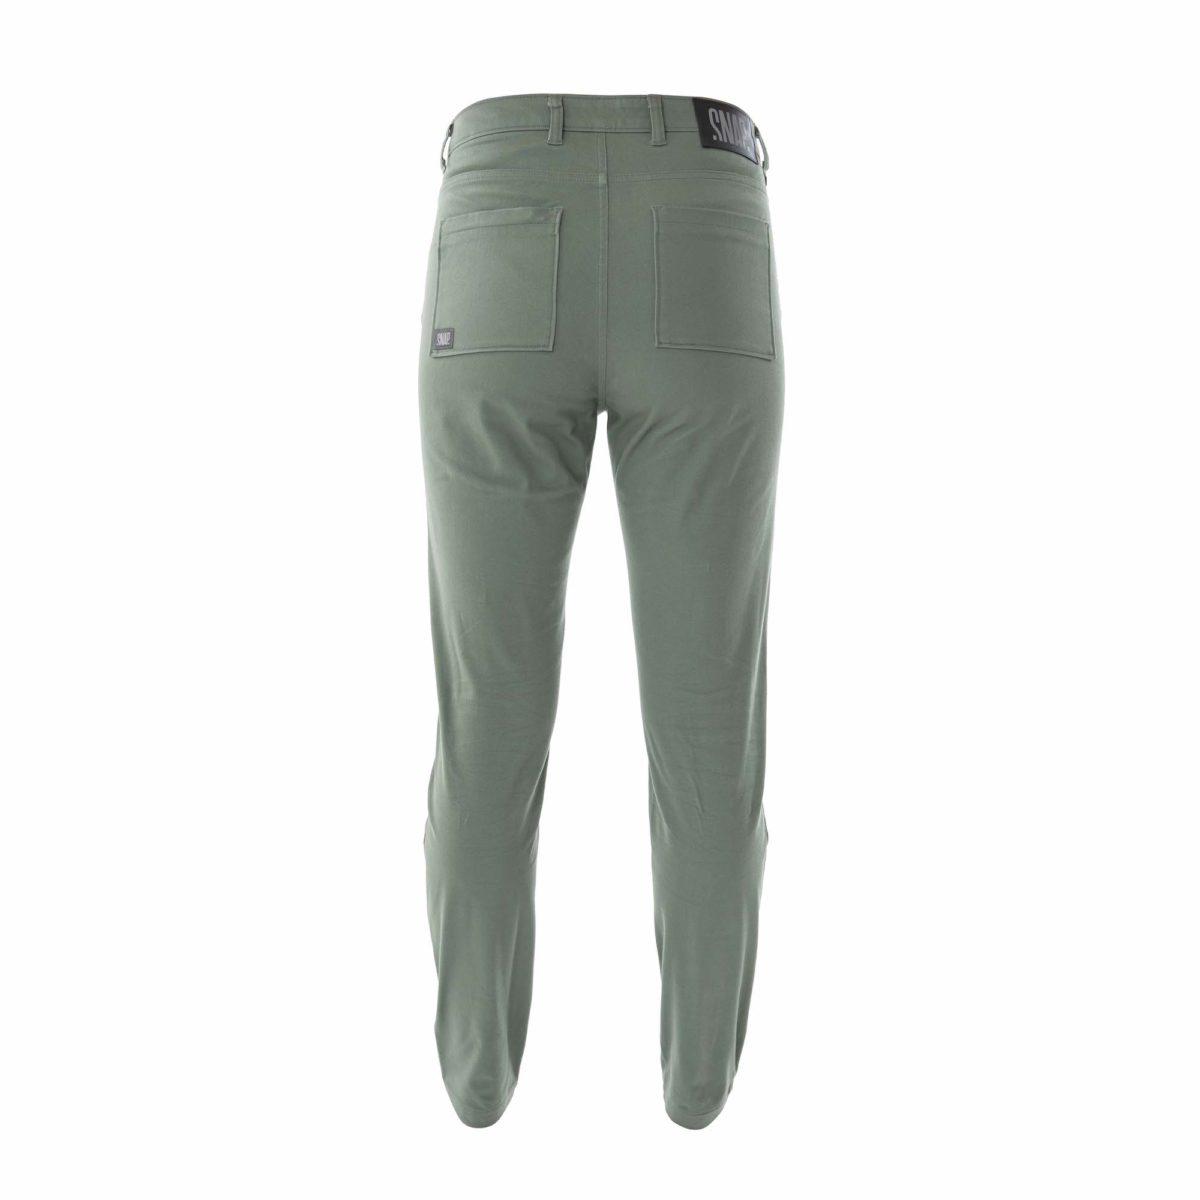 high rise pants kaki color woman